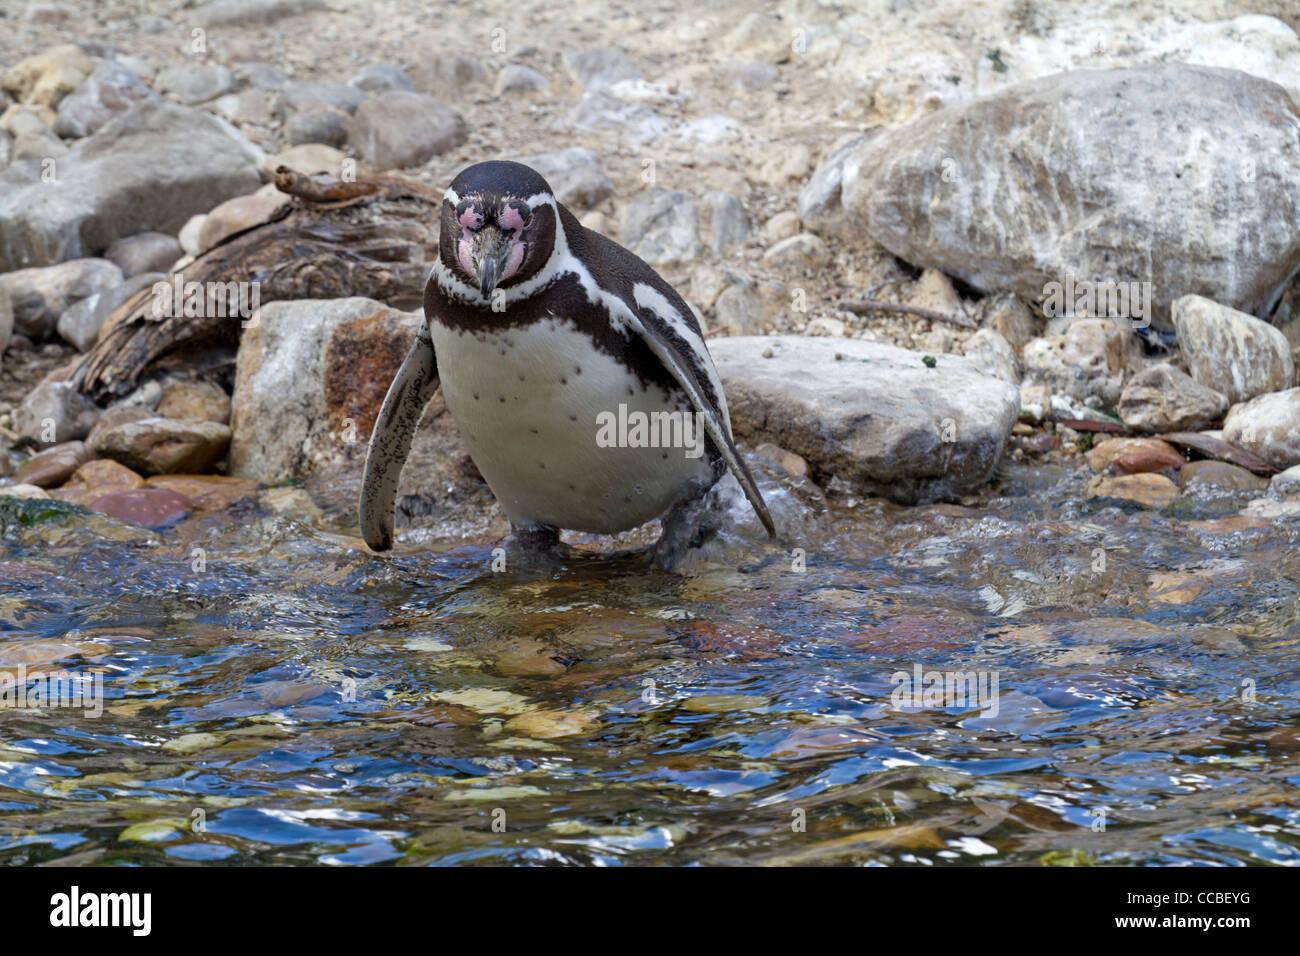 Humboldt Penguins (Spheniscus humboldti) Stock Photo